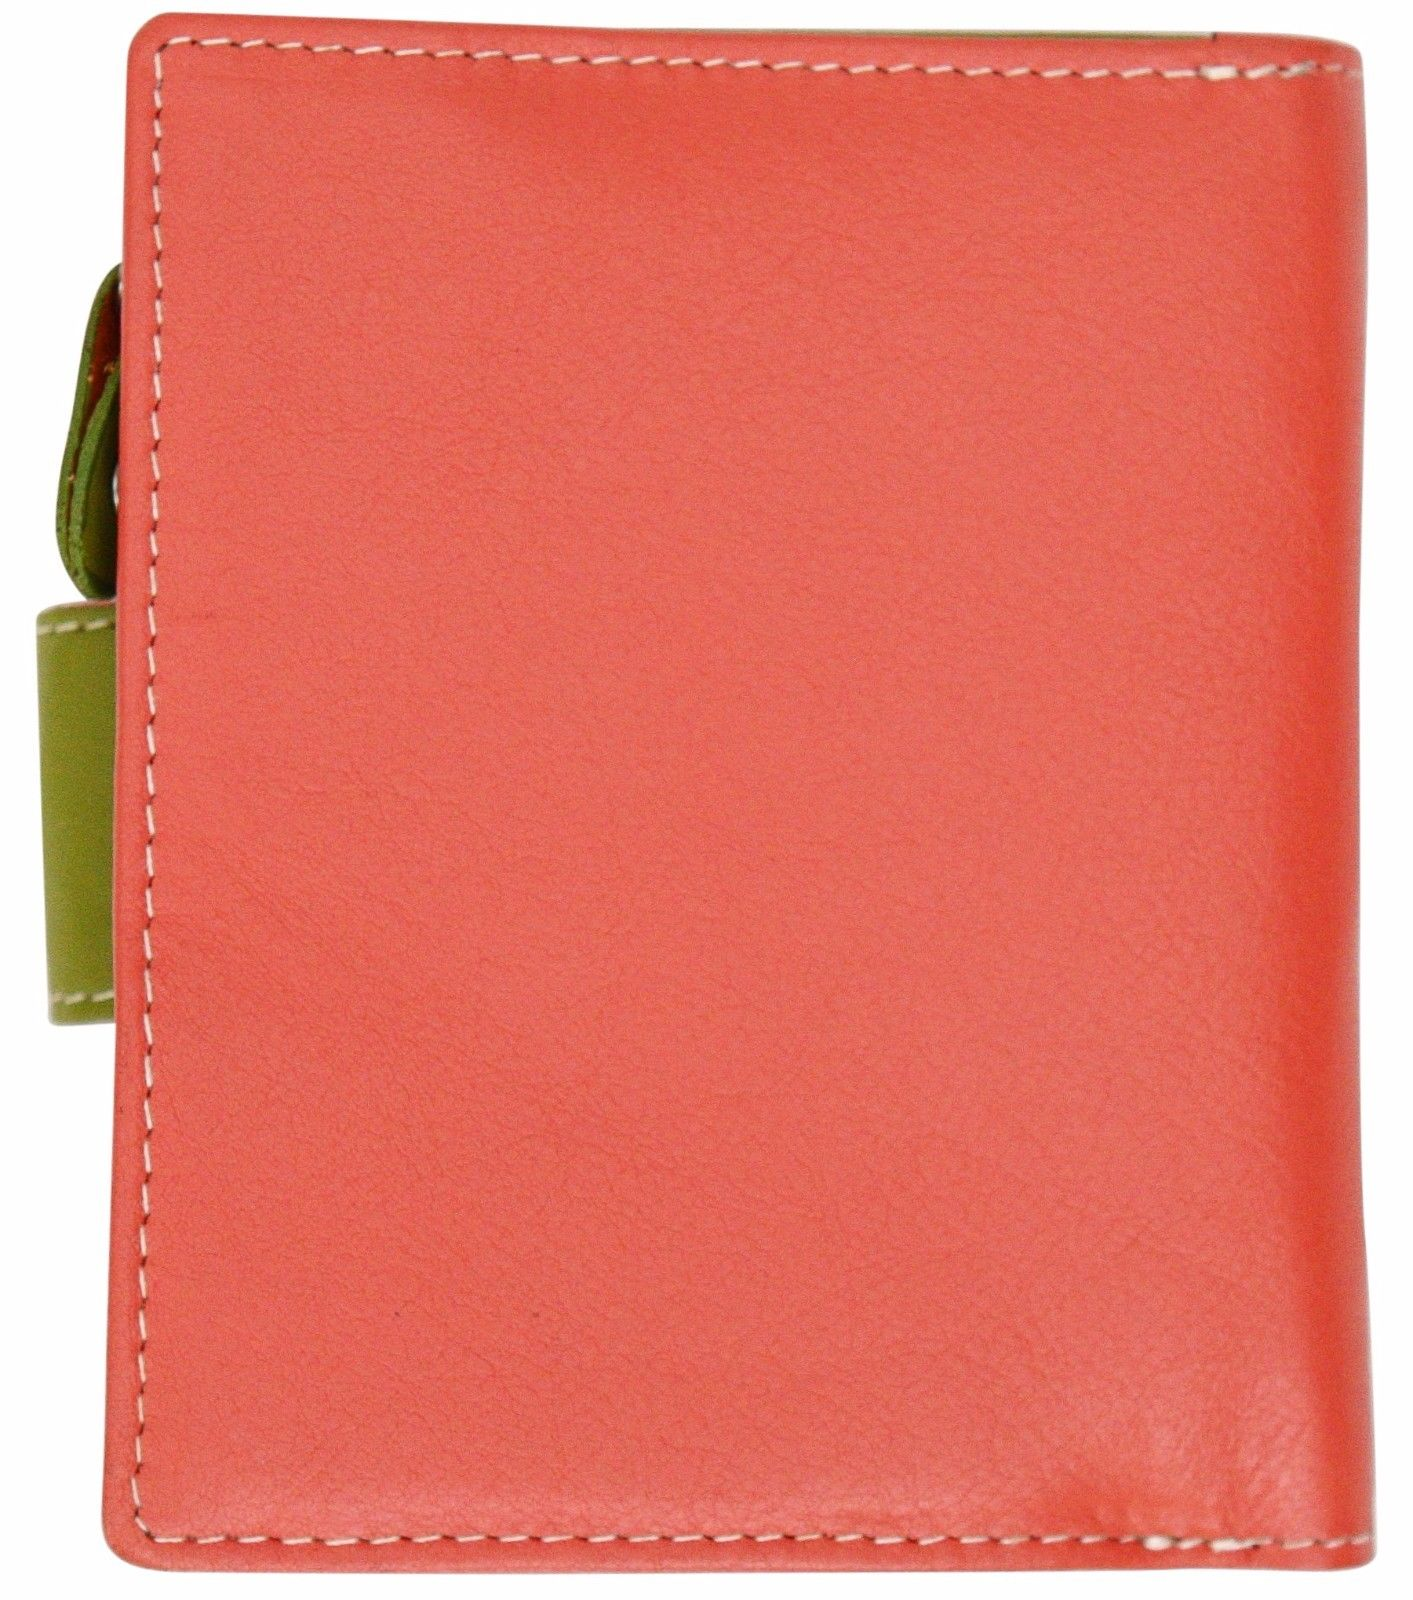 Felda-RFID-onorevoli-MEDAGLIA-amp-Card-Purse-Wallet-Genuine-Leather-Multi-SOFT-BOX-REGALO miniatura 29